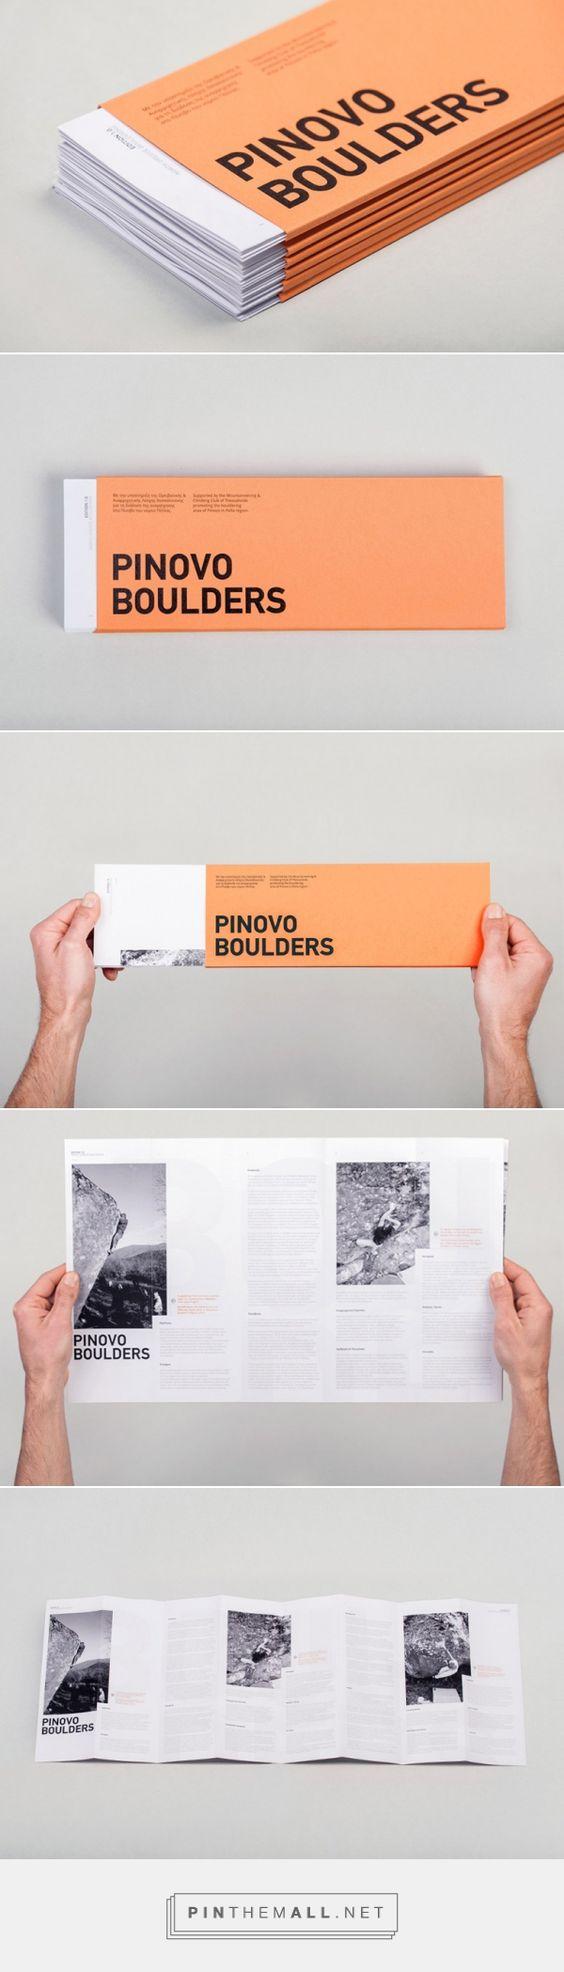 FPO: Pinovo Boulders Brochure - created via http://pinthemall.net